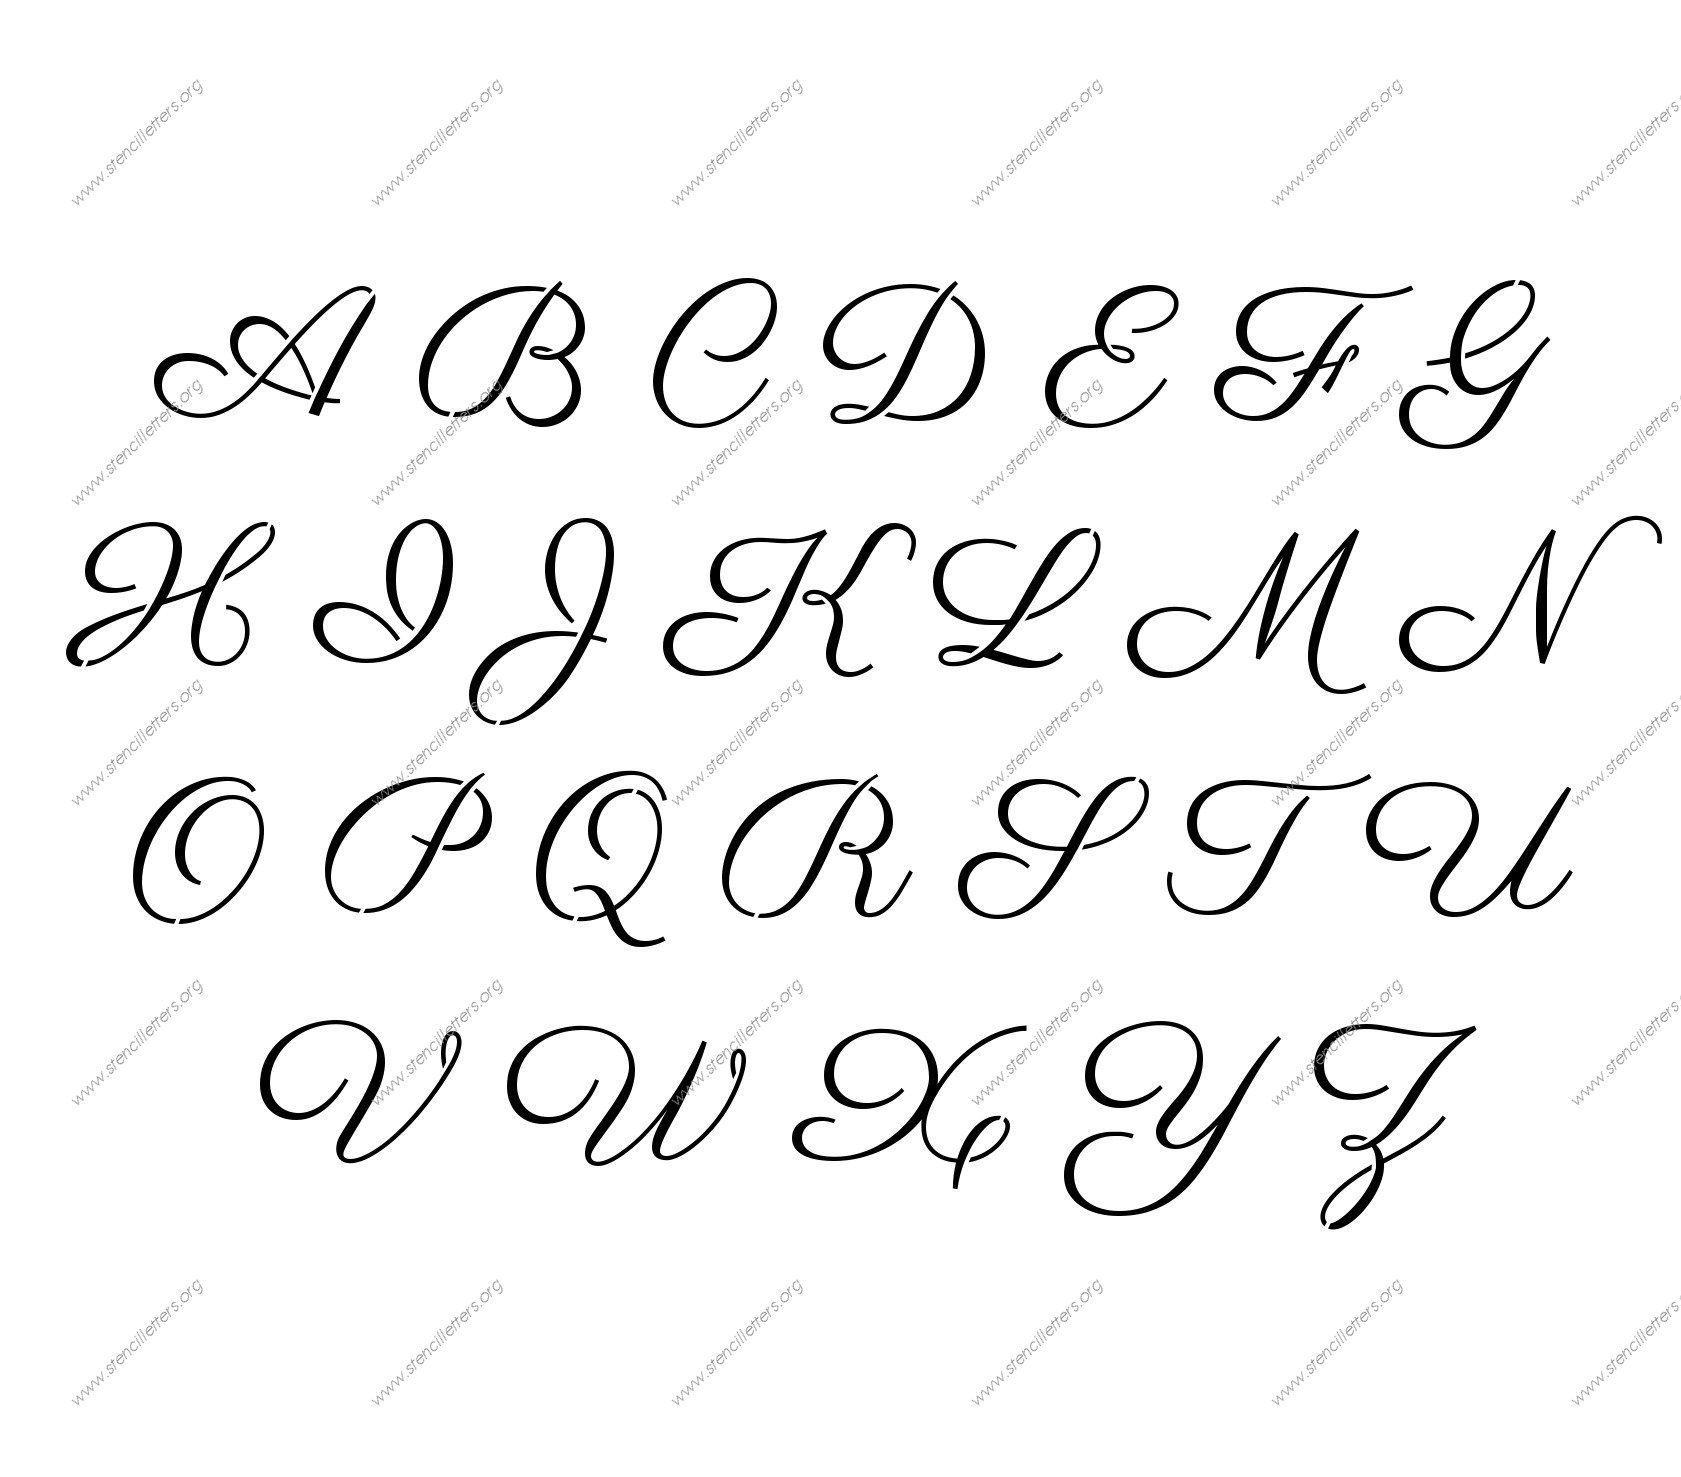 Free Printable Alphabet Stencil Letters Template   Art & Crafts - Free Printable Letter Stencils